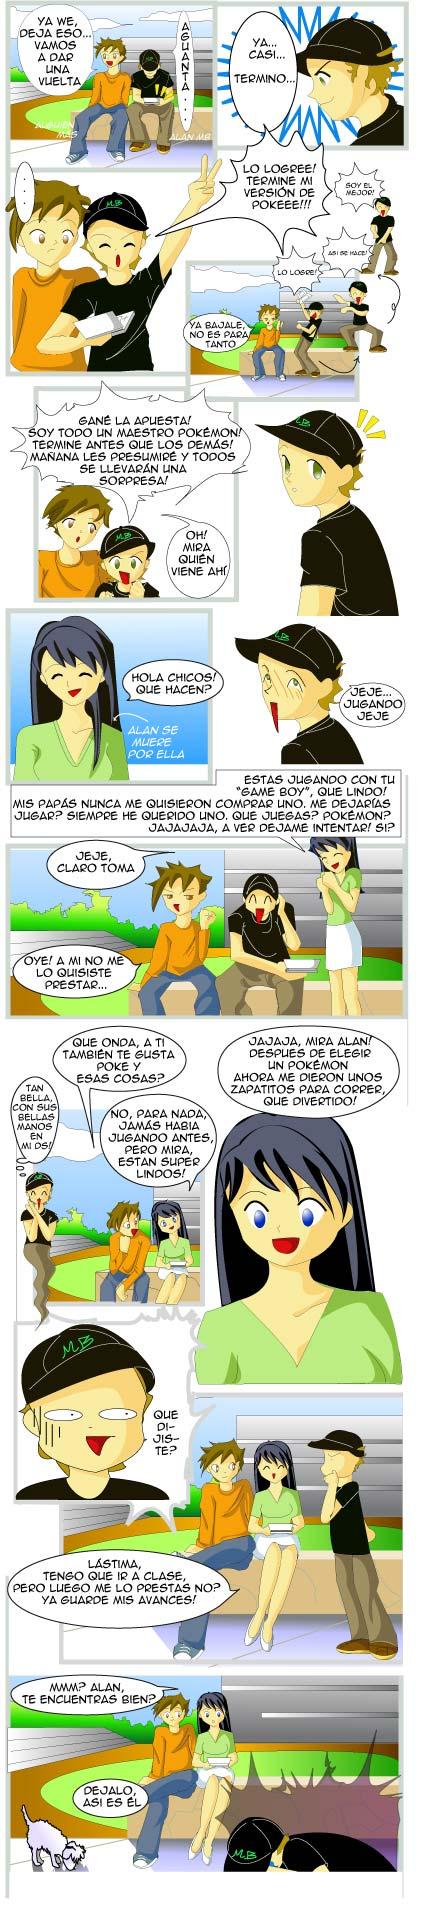 Pokemex Comic 2